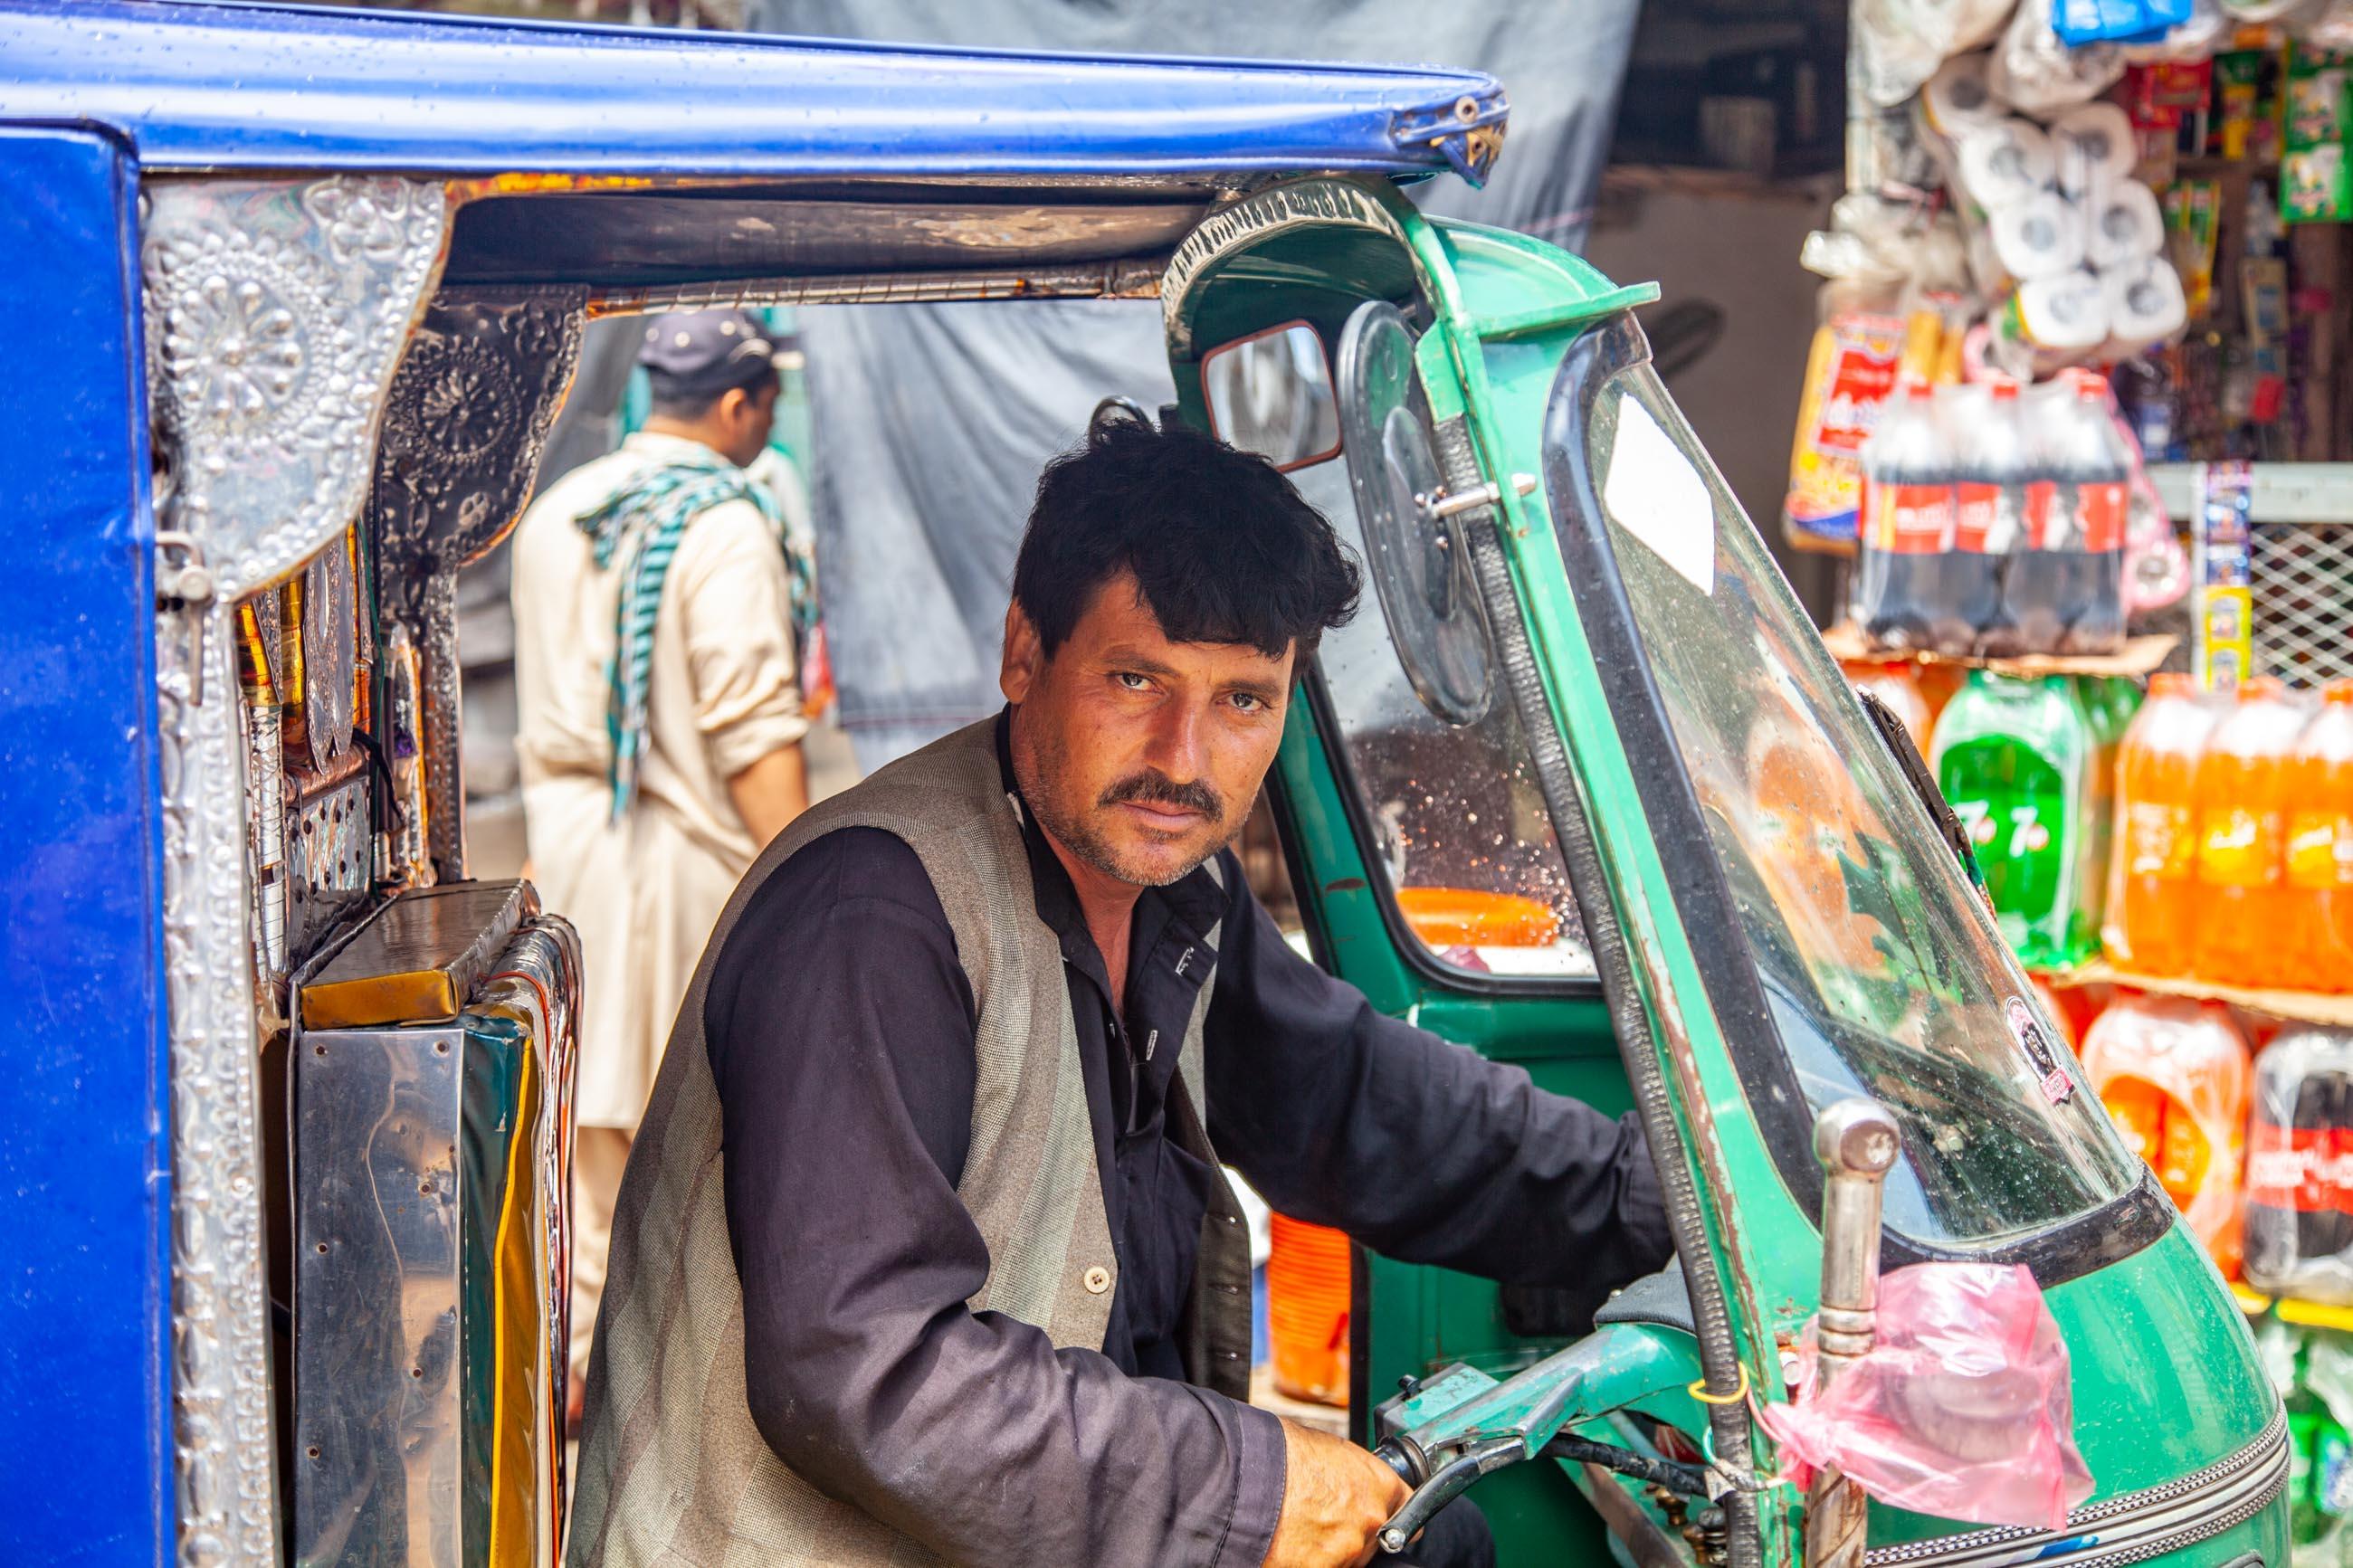 https://bubo.sk/uploads/galleries/4920/samuelklc_pakistan_peshawar_lahore_img_0014.jpg